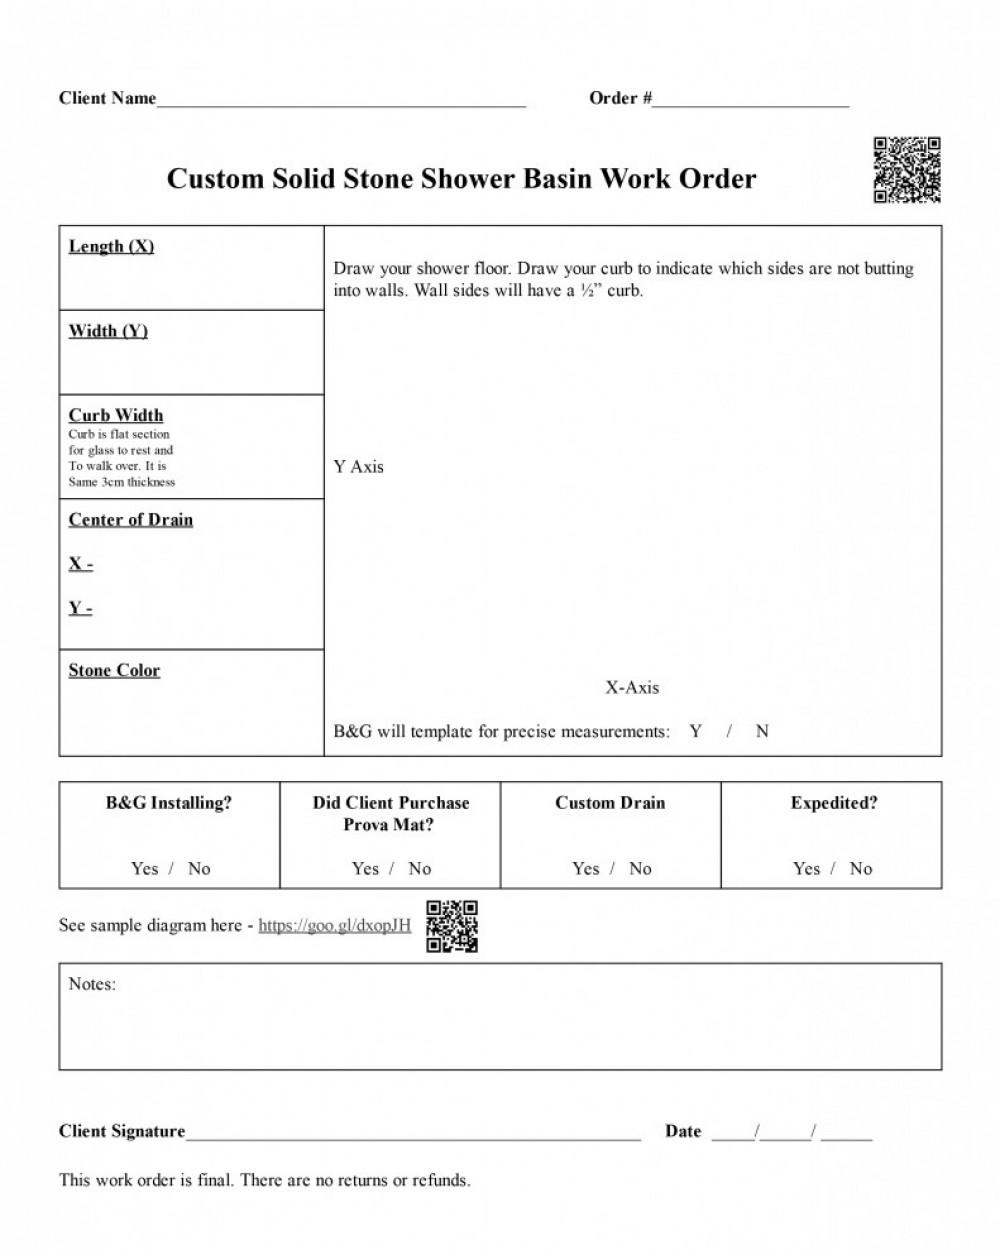 How To Measure Your Shower Basin Denver Shower Doors